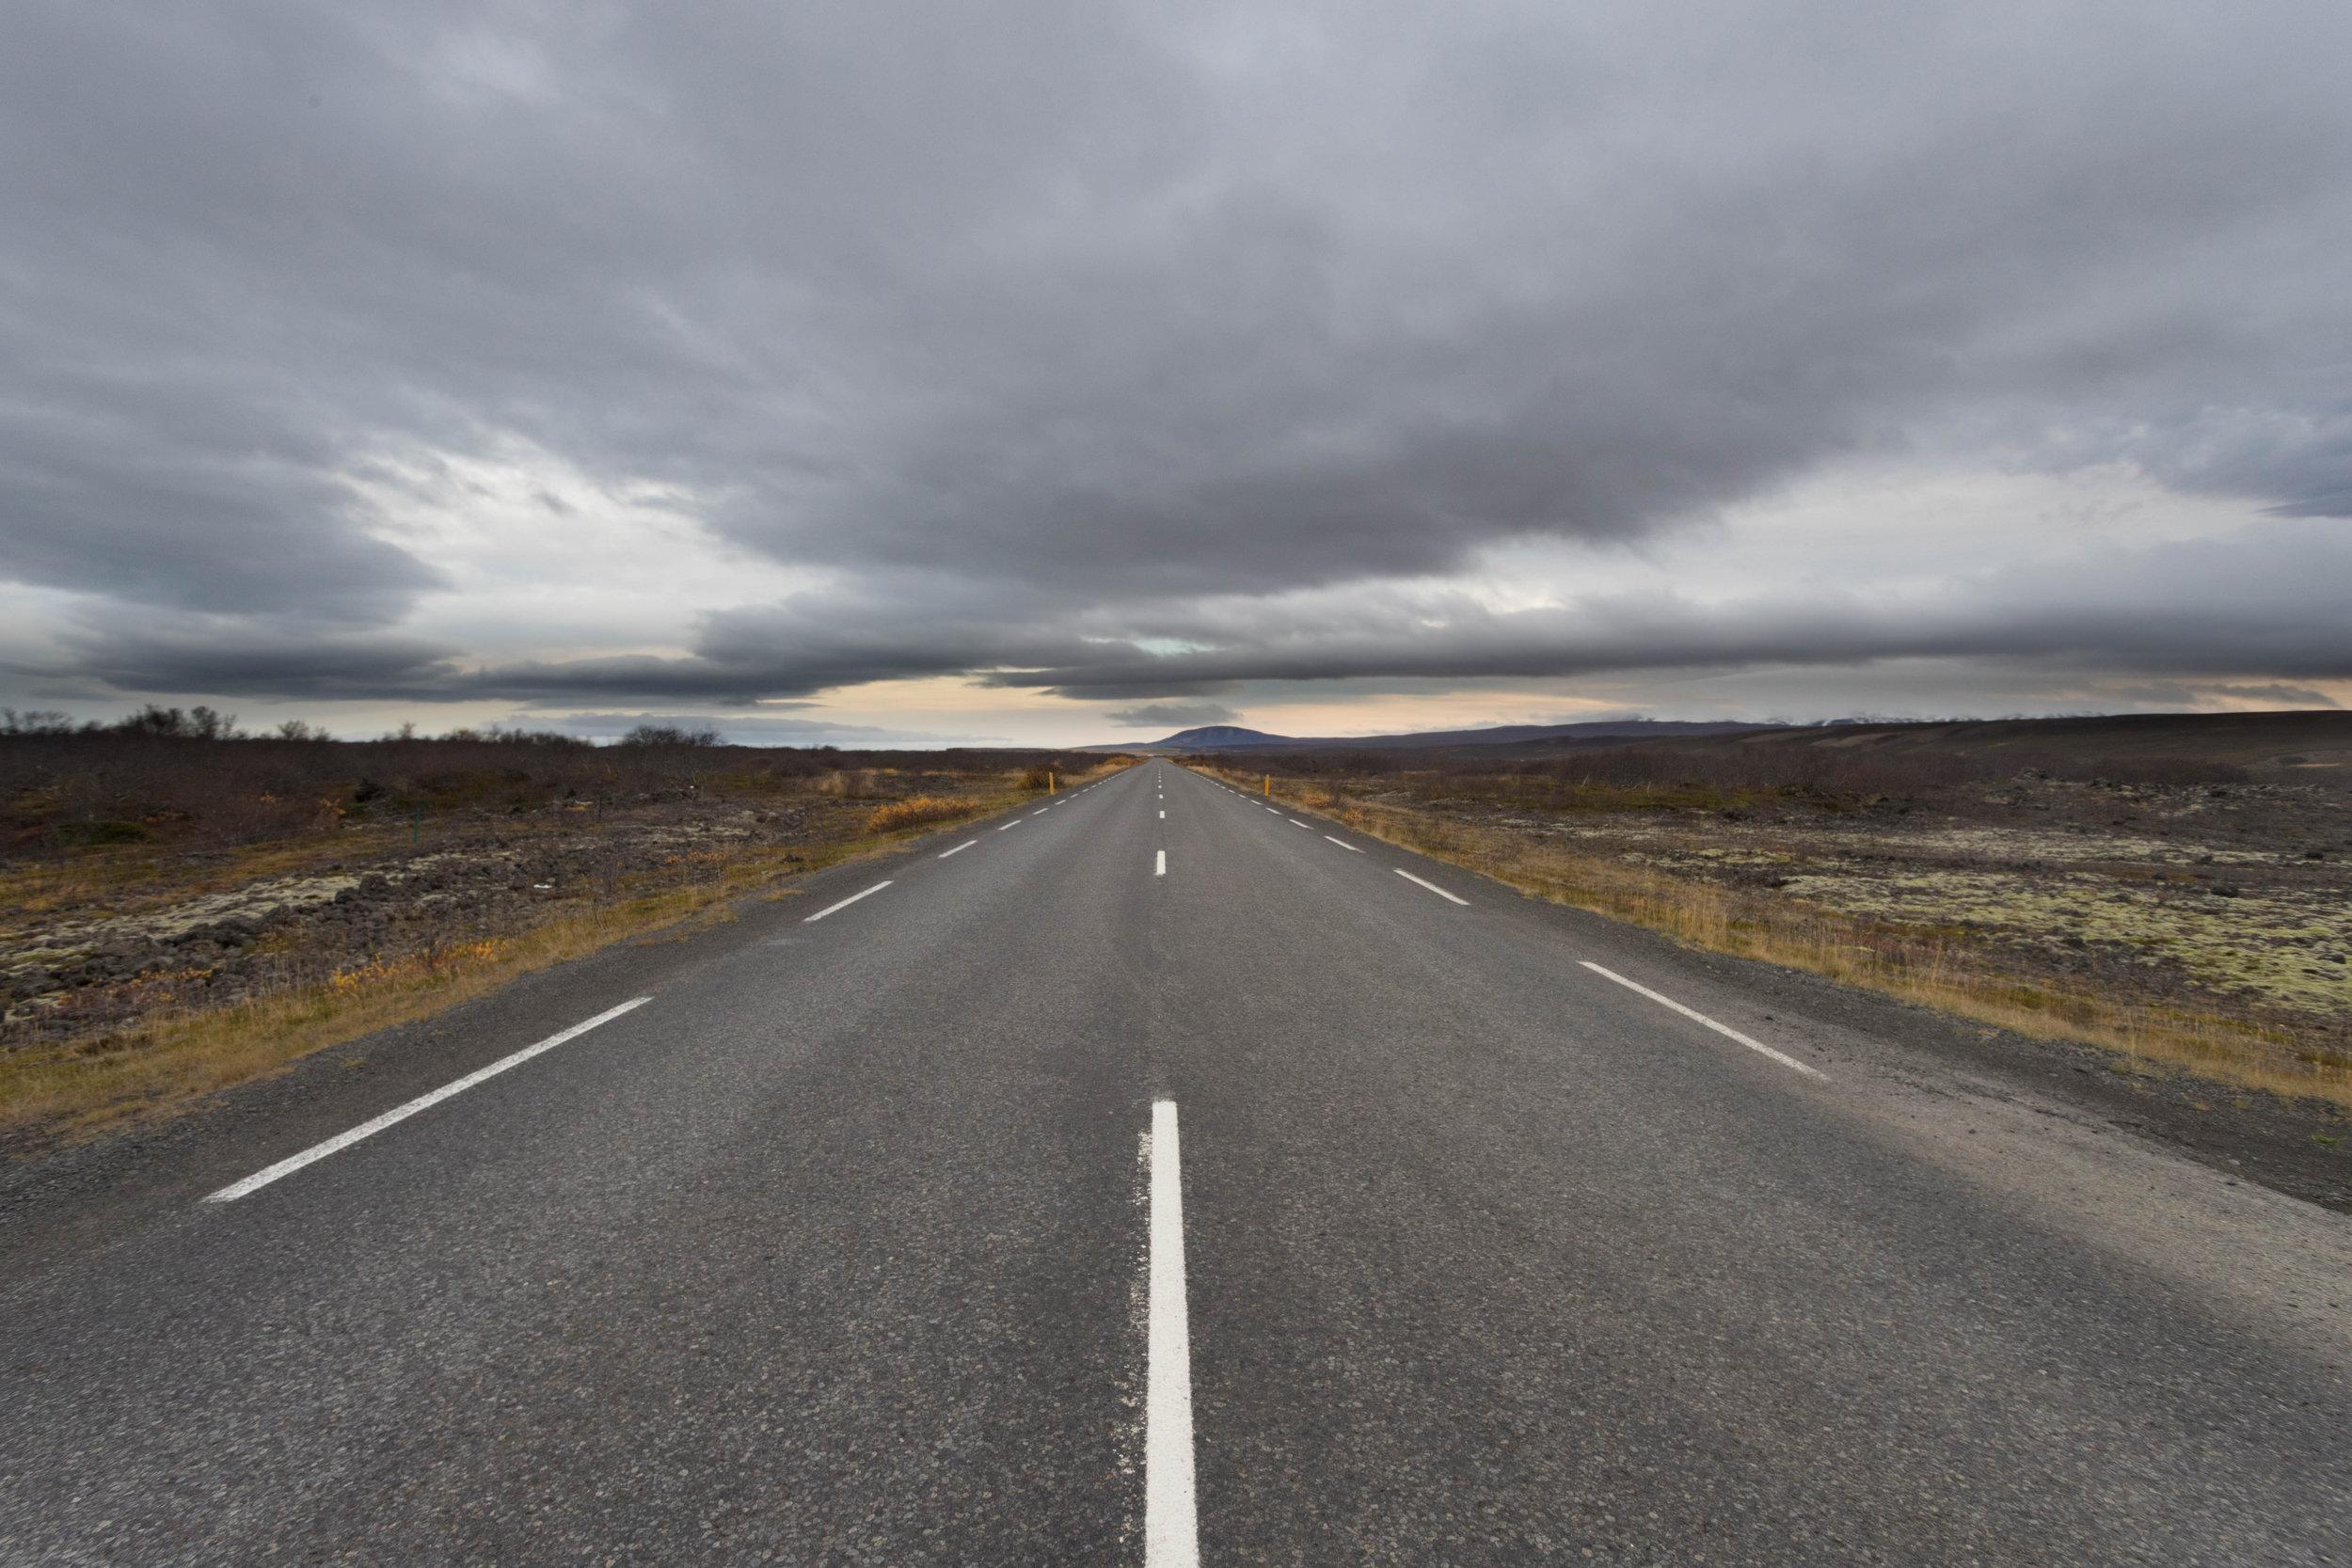 icelandic road #1 - tjörneshreppur